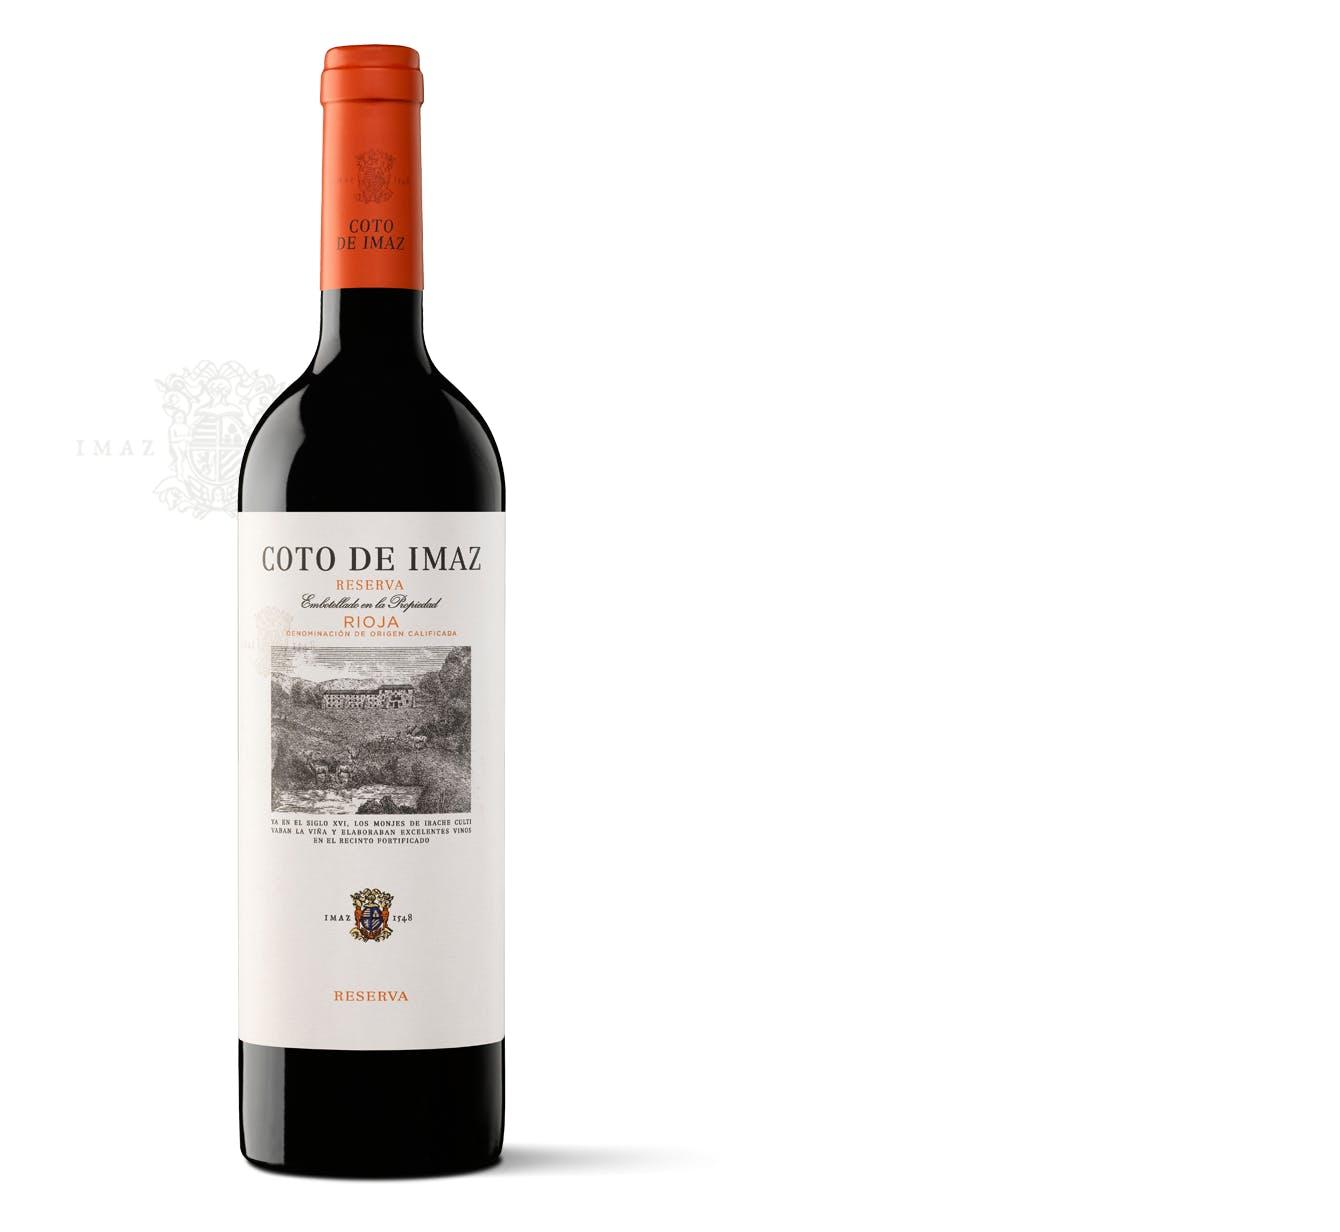 El Coto De Rioja Coto De Imaz Reserva 2015 Allendale Wine Shoppe